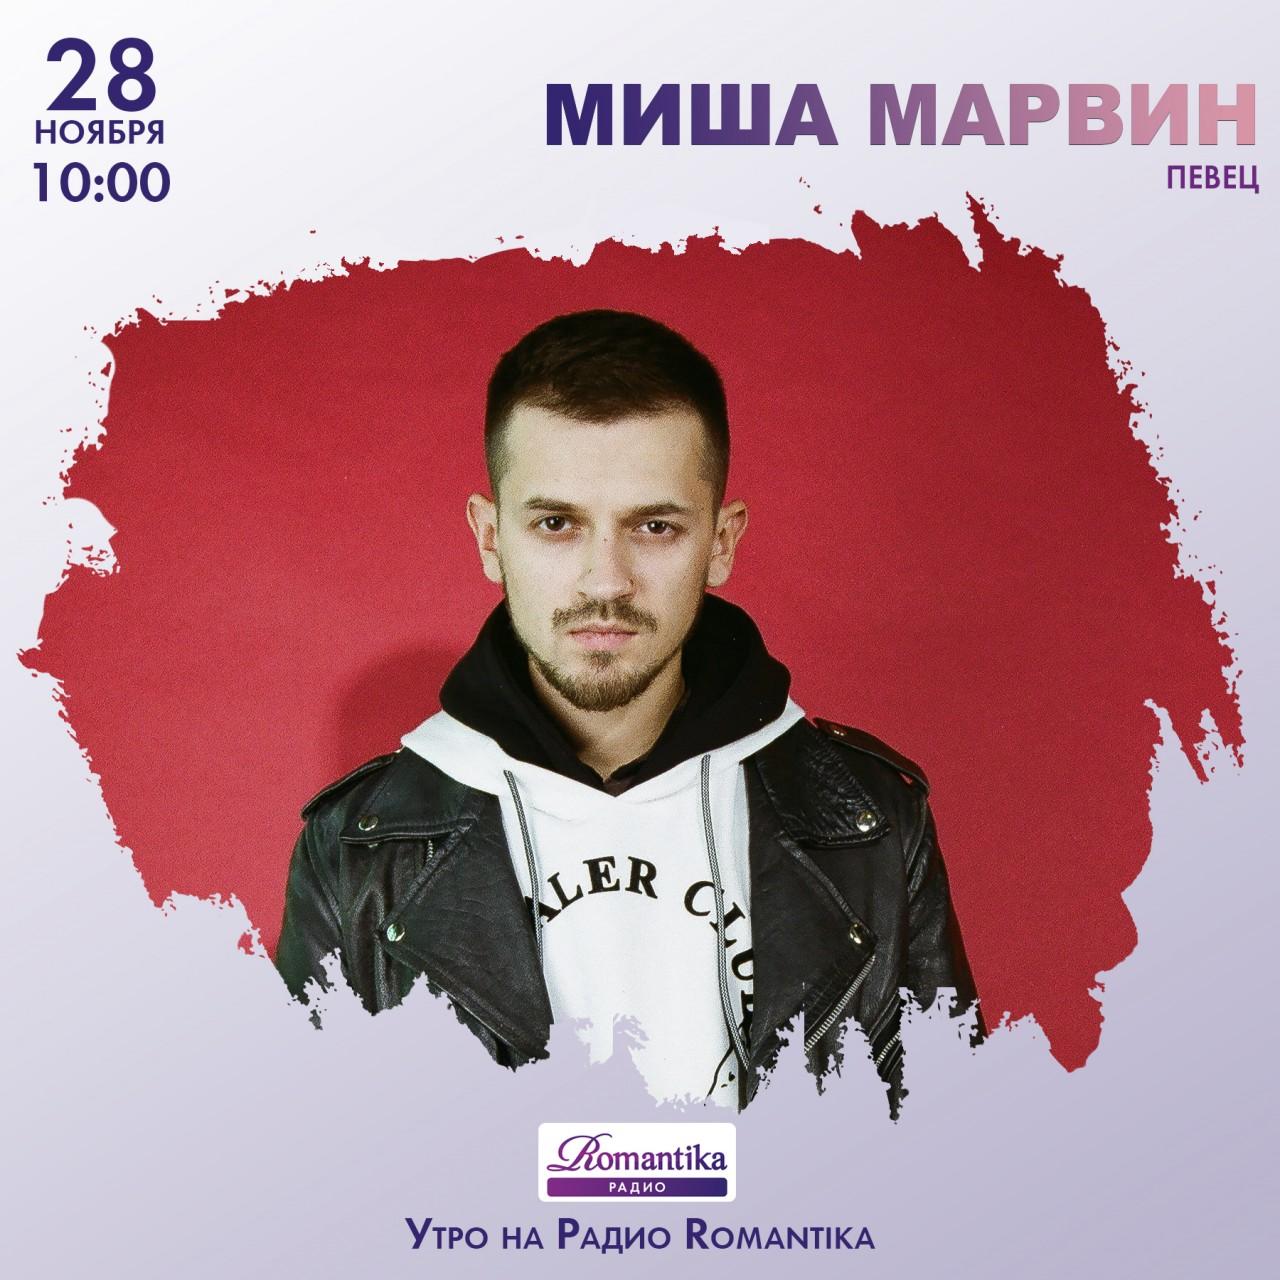 Радио Romantika: 28 ноября 1…